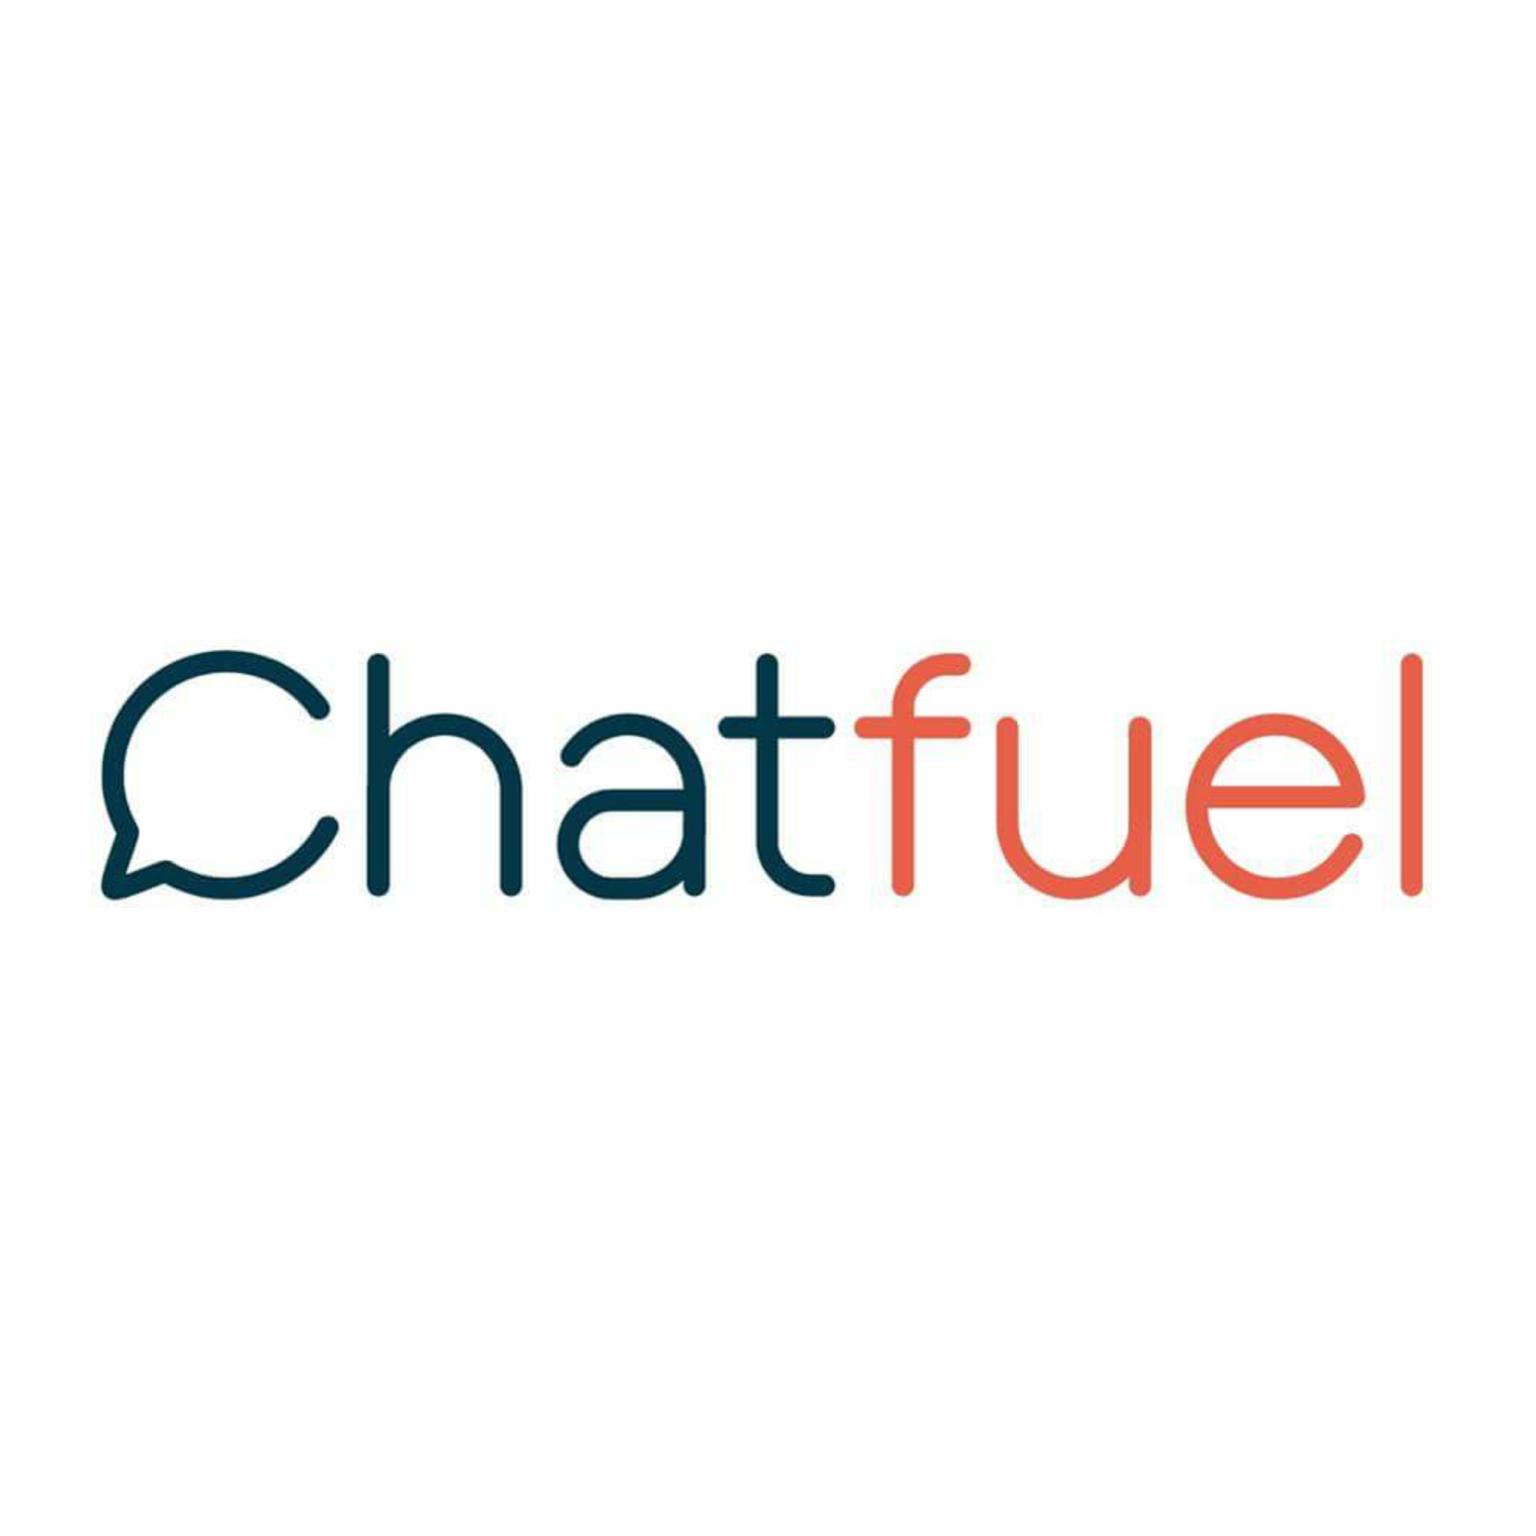 Chatfuel দিয়ে খুব সহজে আপনার ফেসবুক পেজের জন্য Messenger Bot বানান.. [Best platform for beginners] [Part 2]